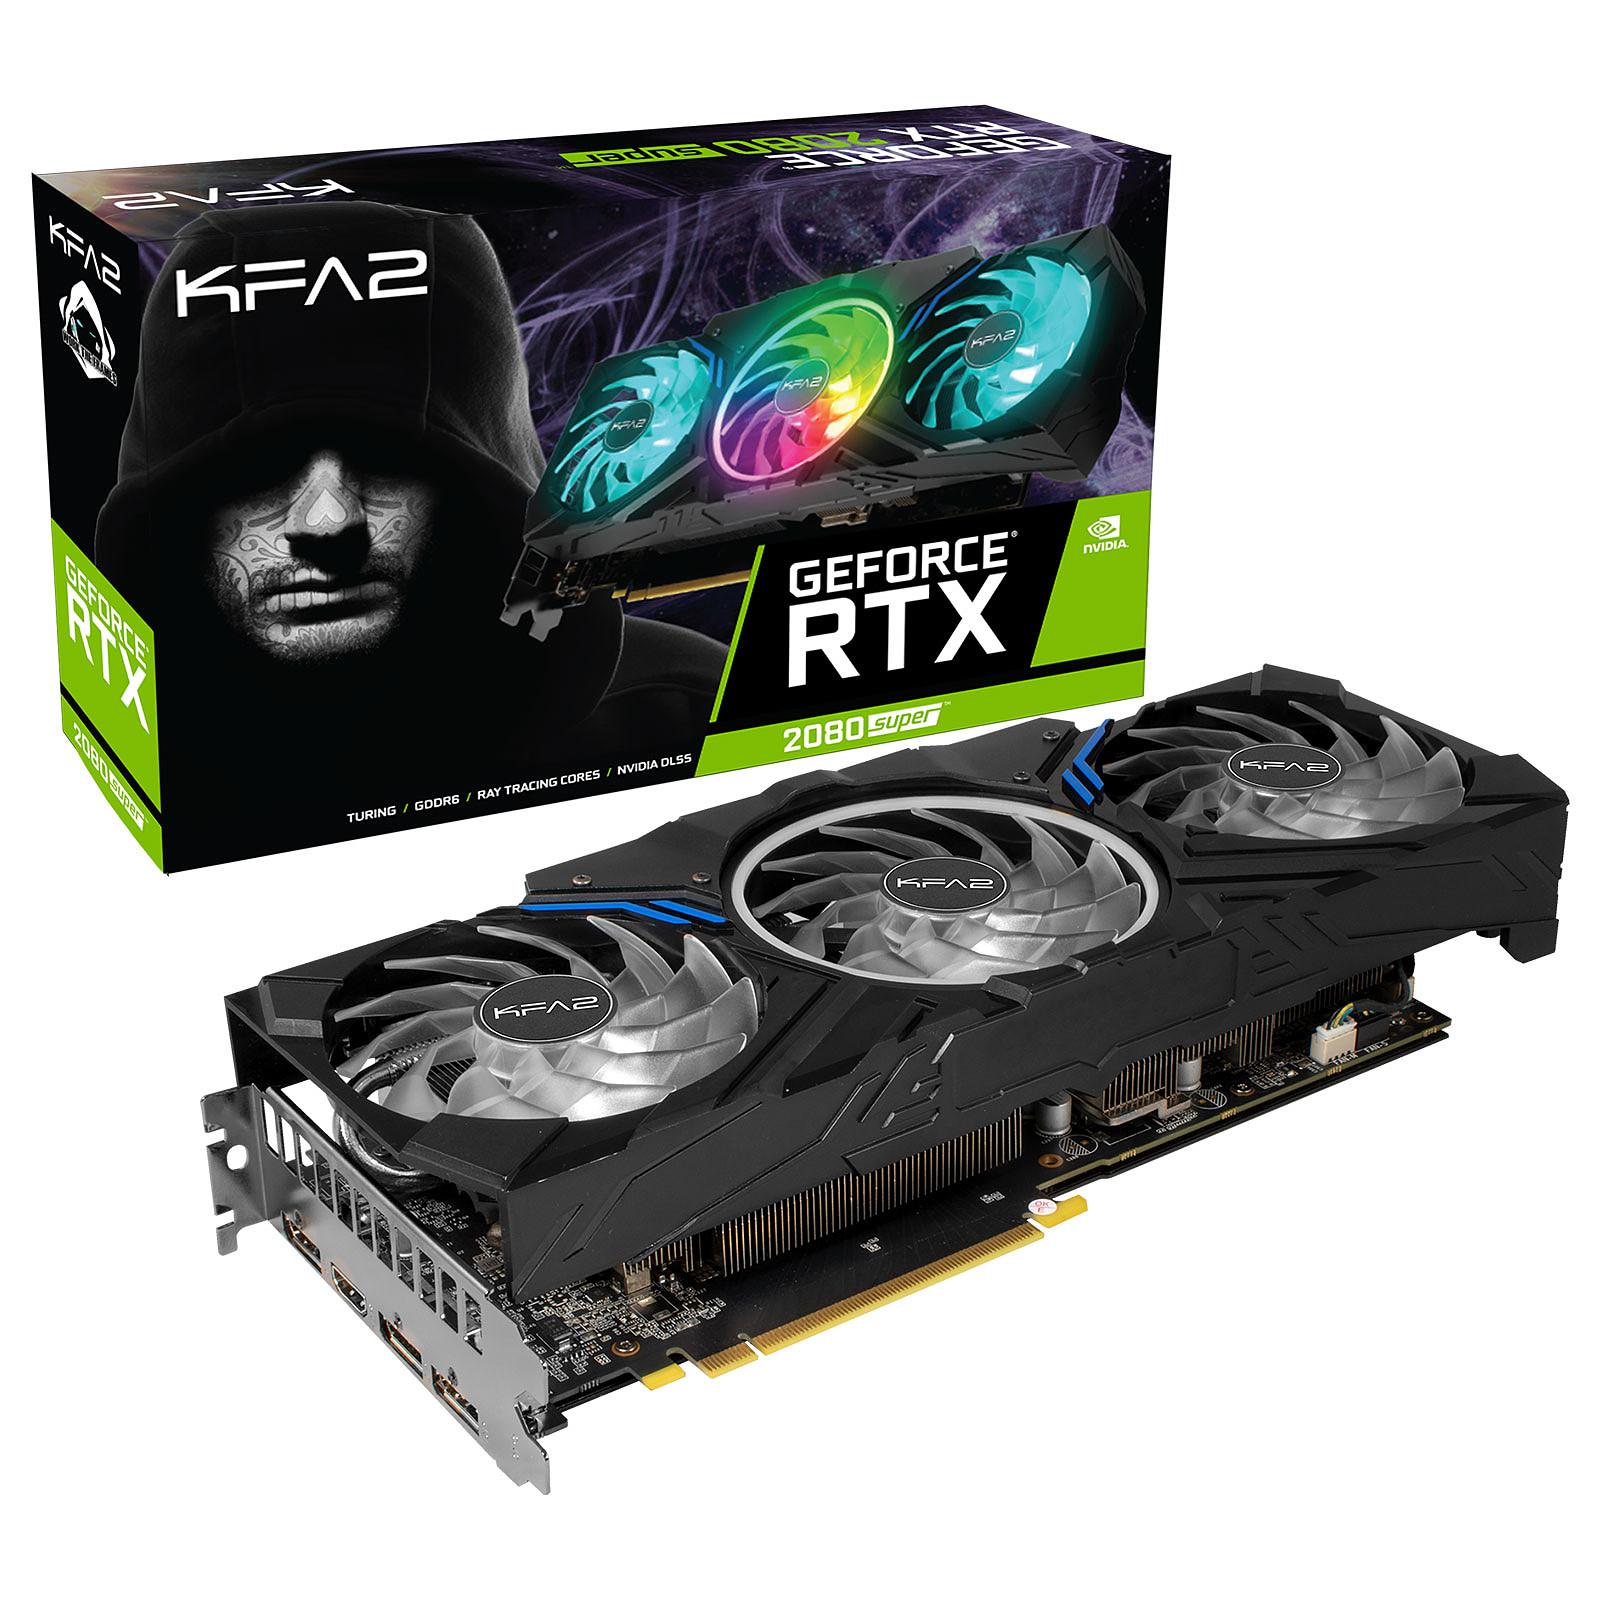 KFA2 GeForce RTX 2080 SUPER Work The Frames Edition